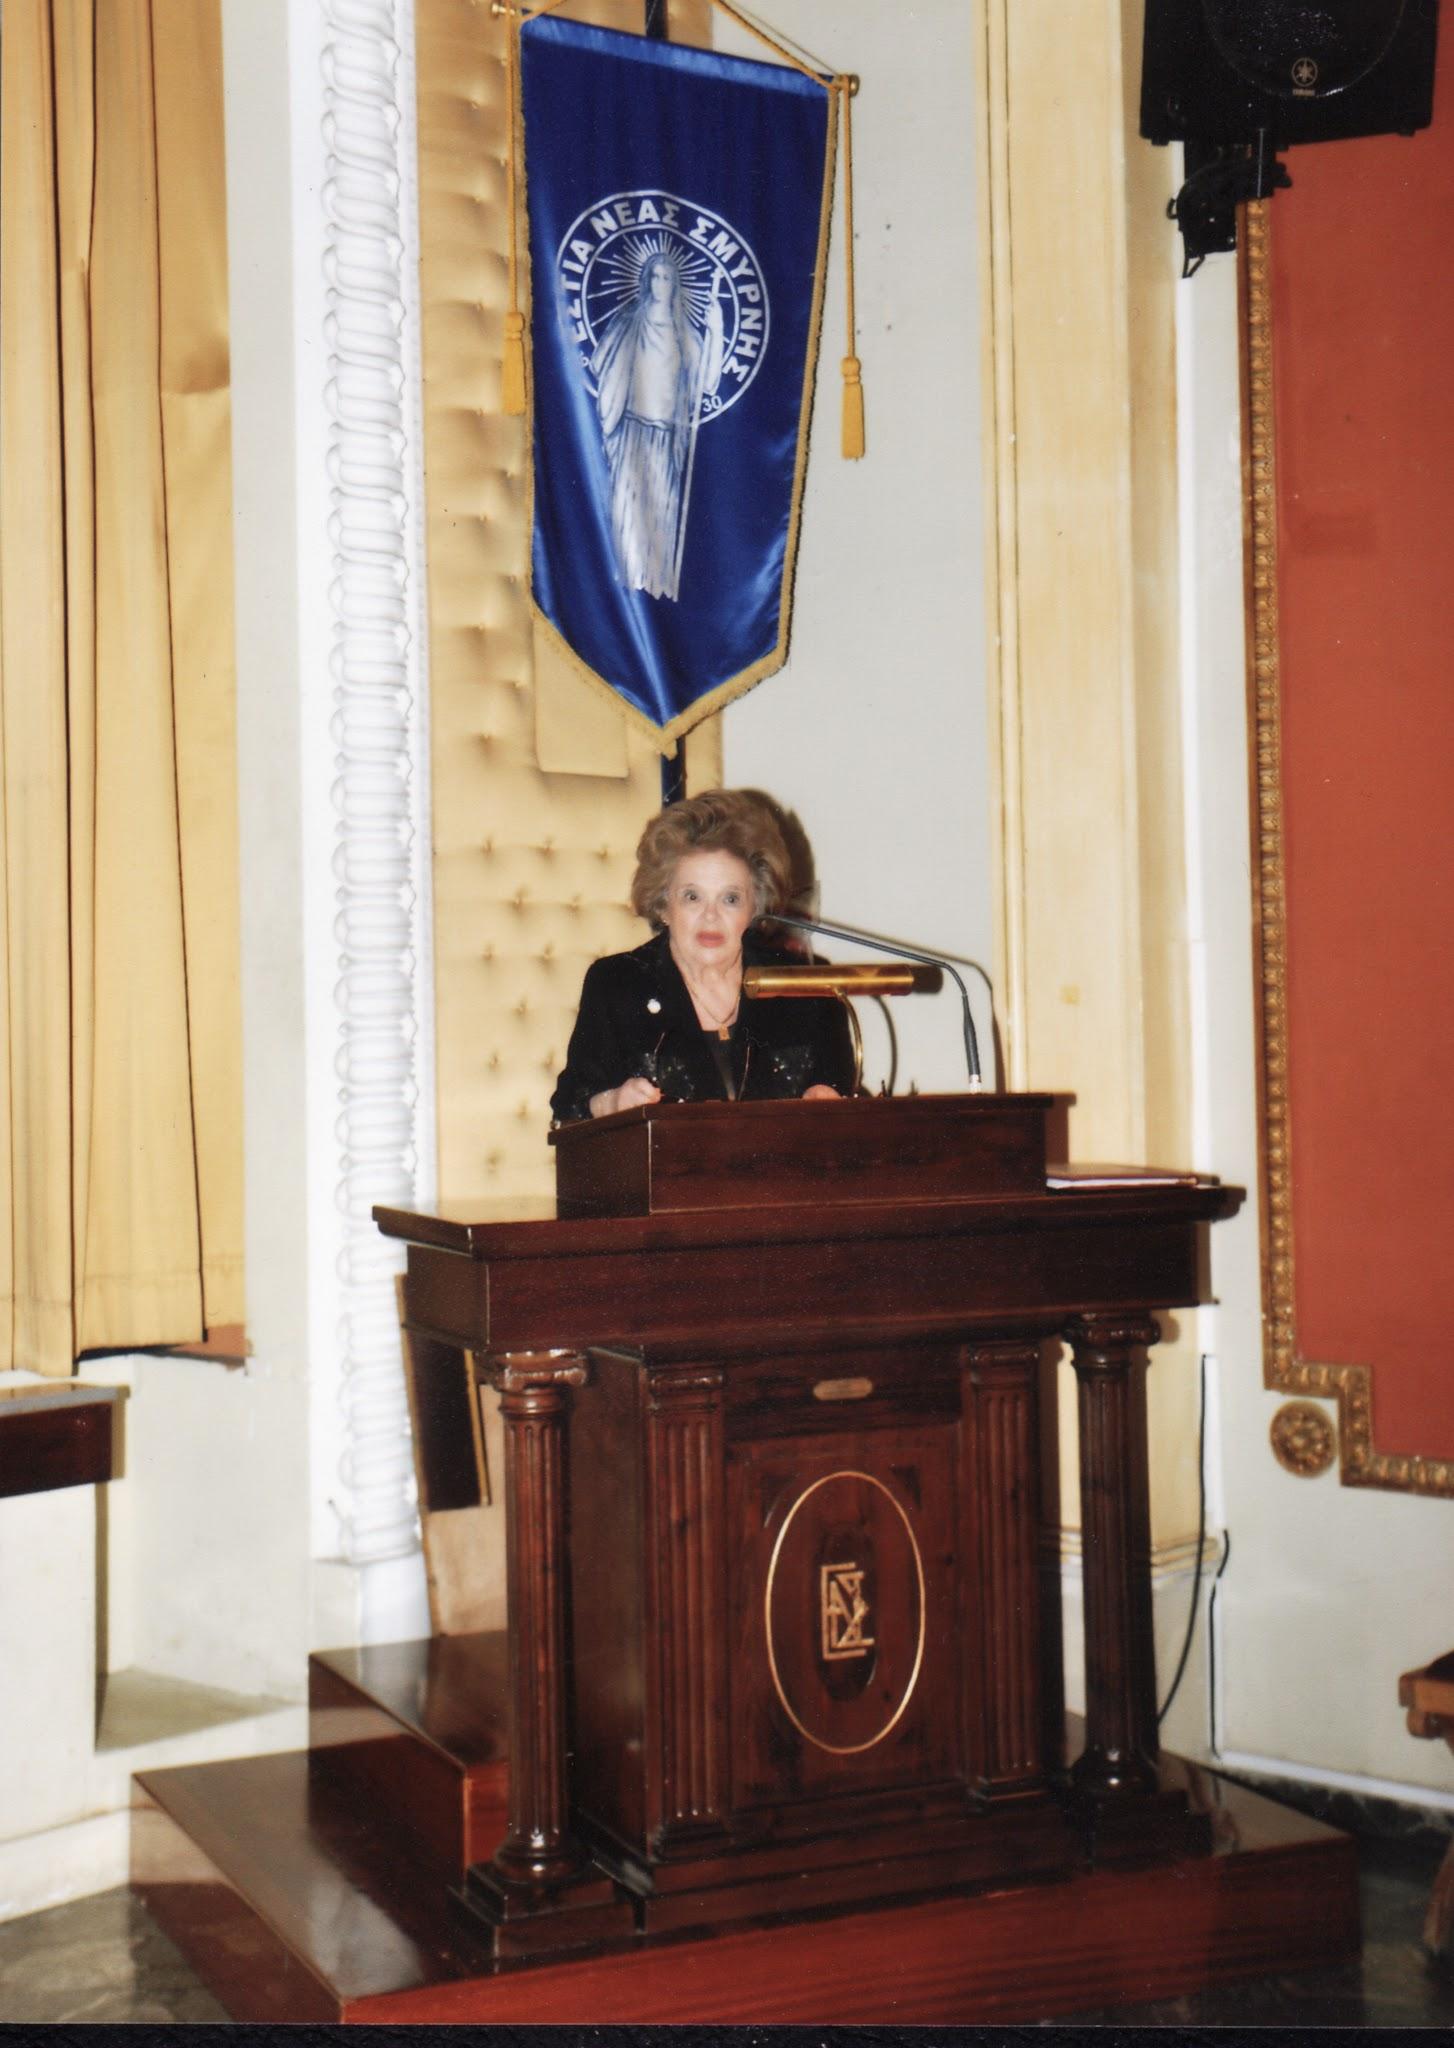 Photo: ΒΙΡΓΙΝΙΑ ΧΑΜΟΥΔΟΠΟΥΛΟΥ-ΚΩΝΣΤΑΝΤΙΝΙΔΟΥ, Γενική Γραμματέας της Εστίας Νέας Σμύρνης.